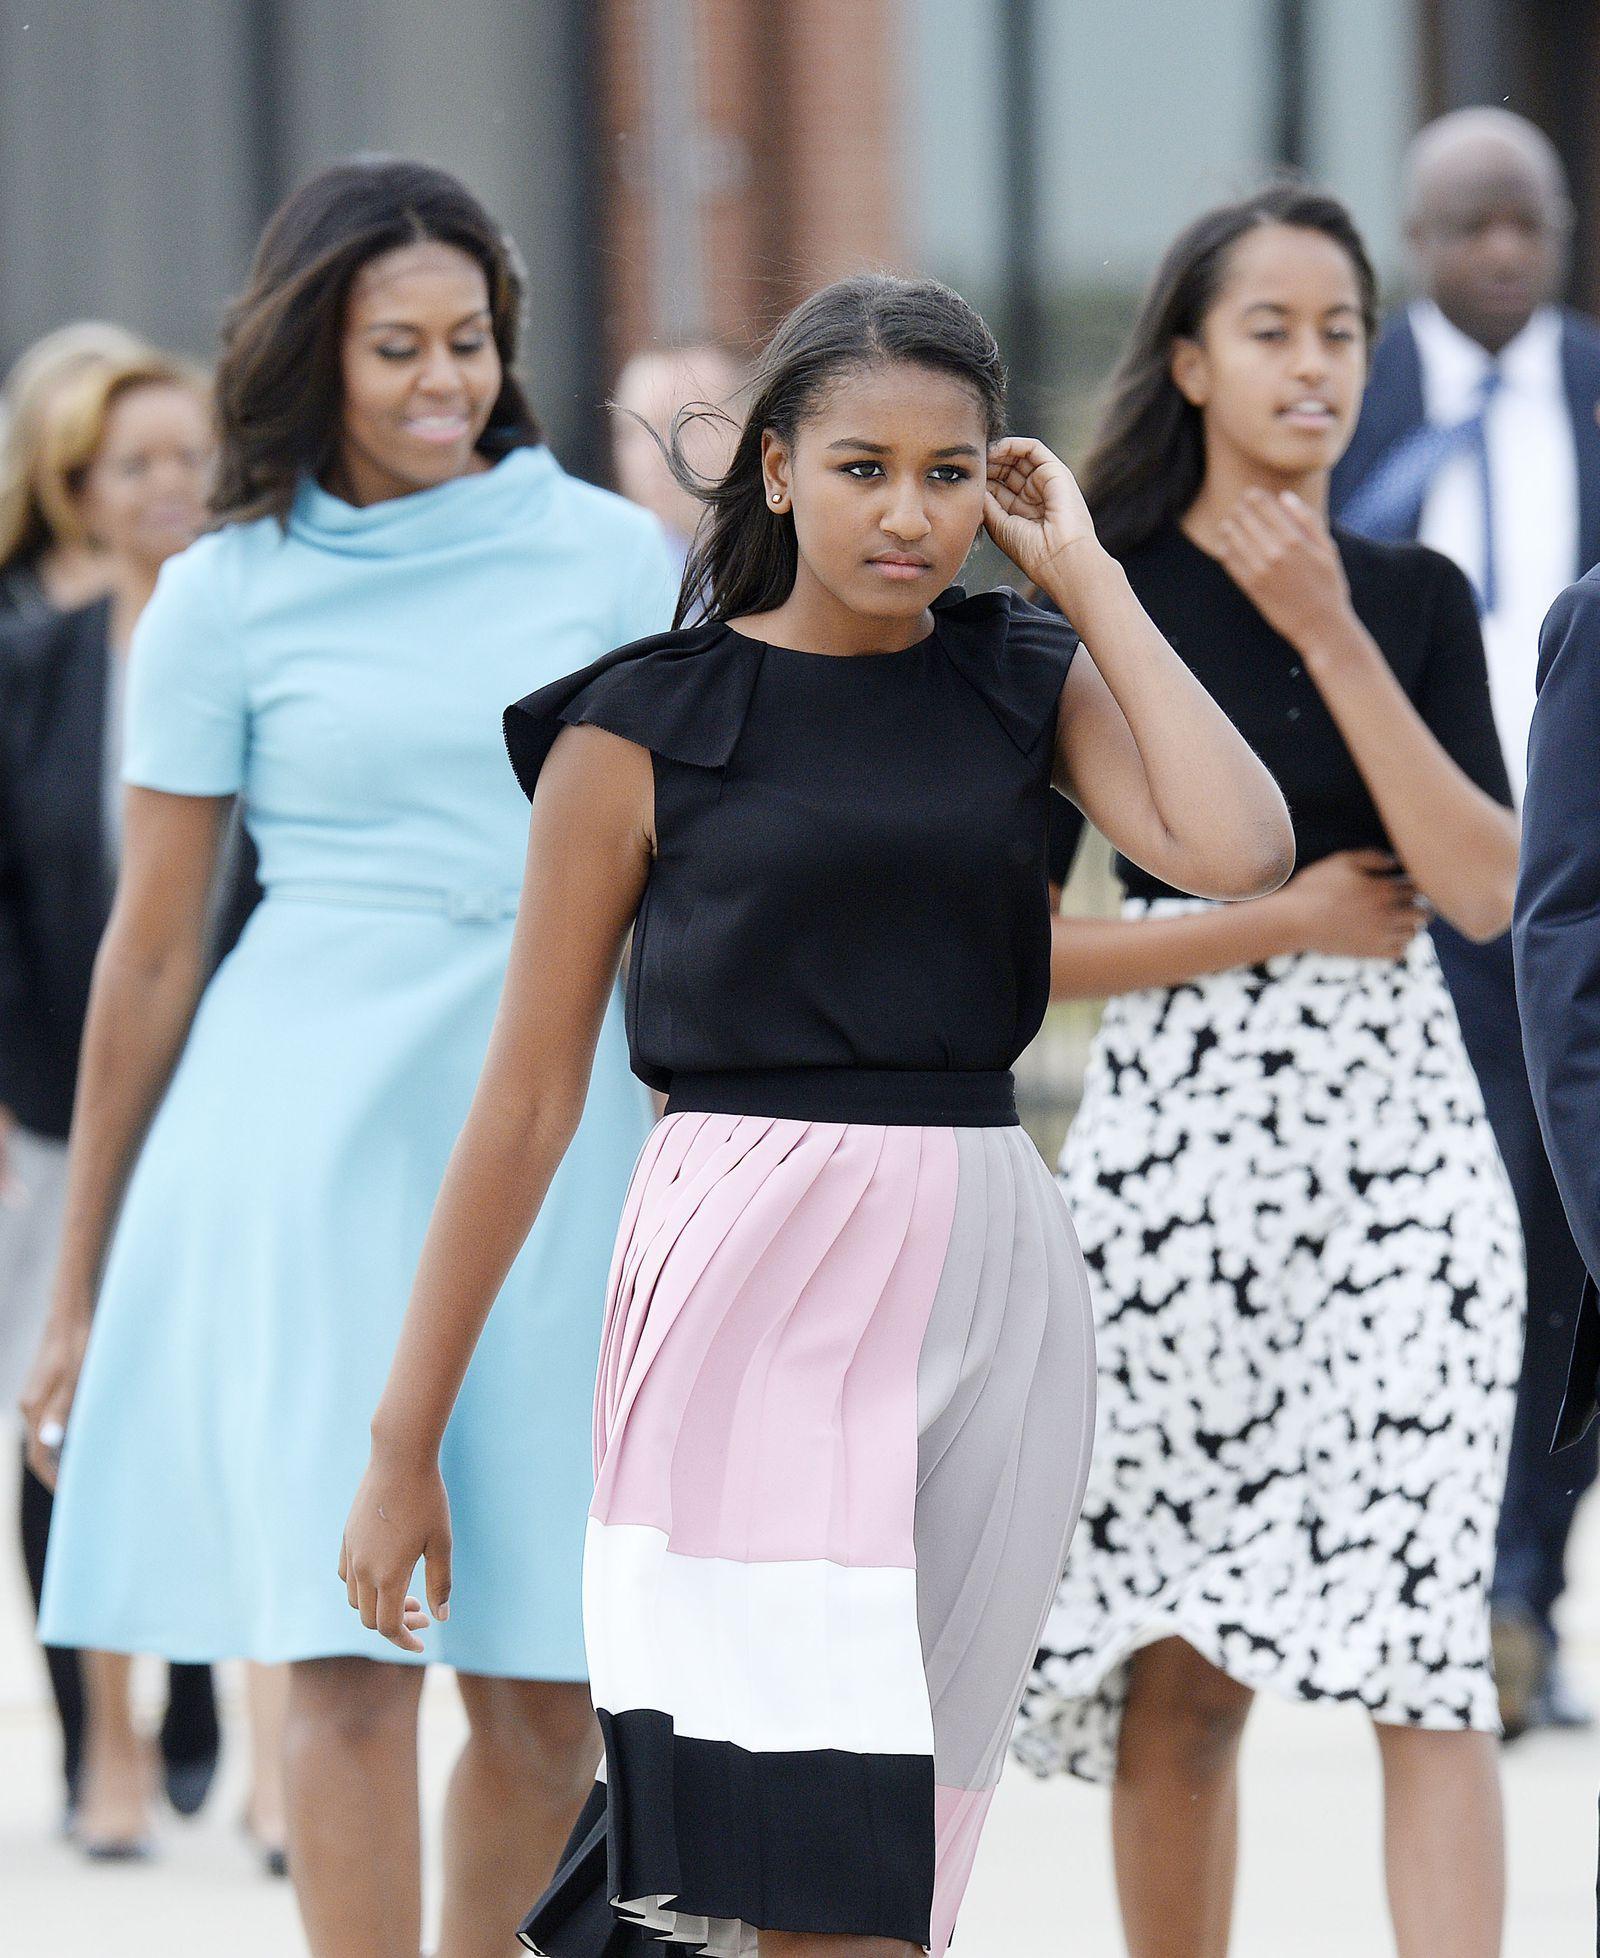 dochters obama